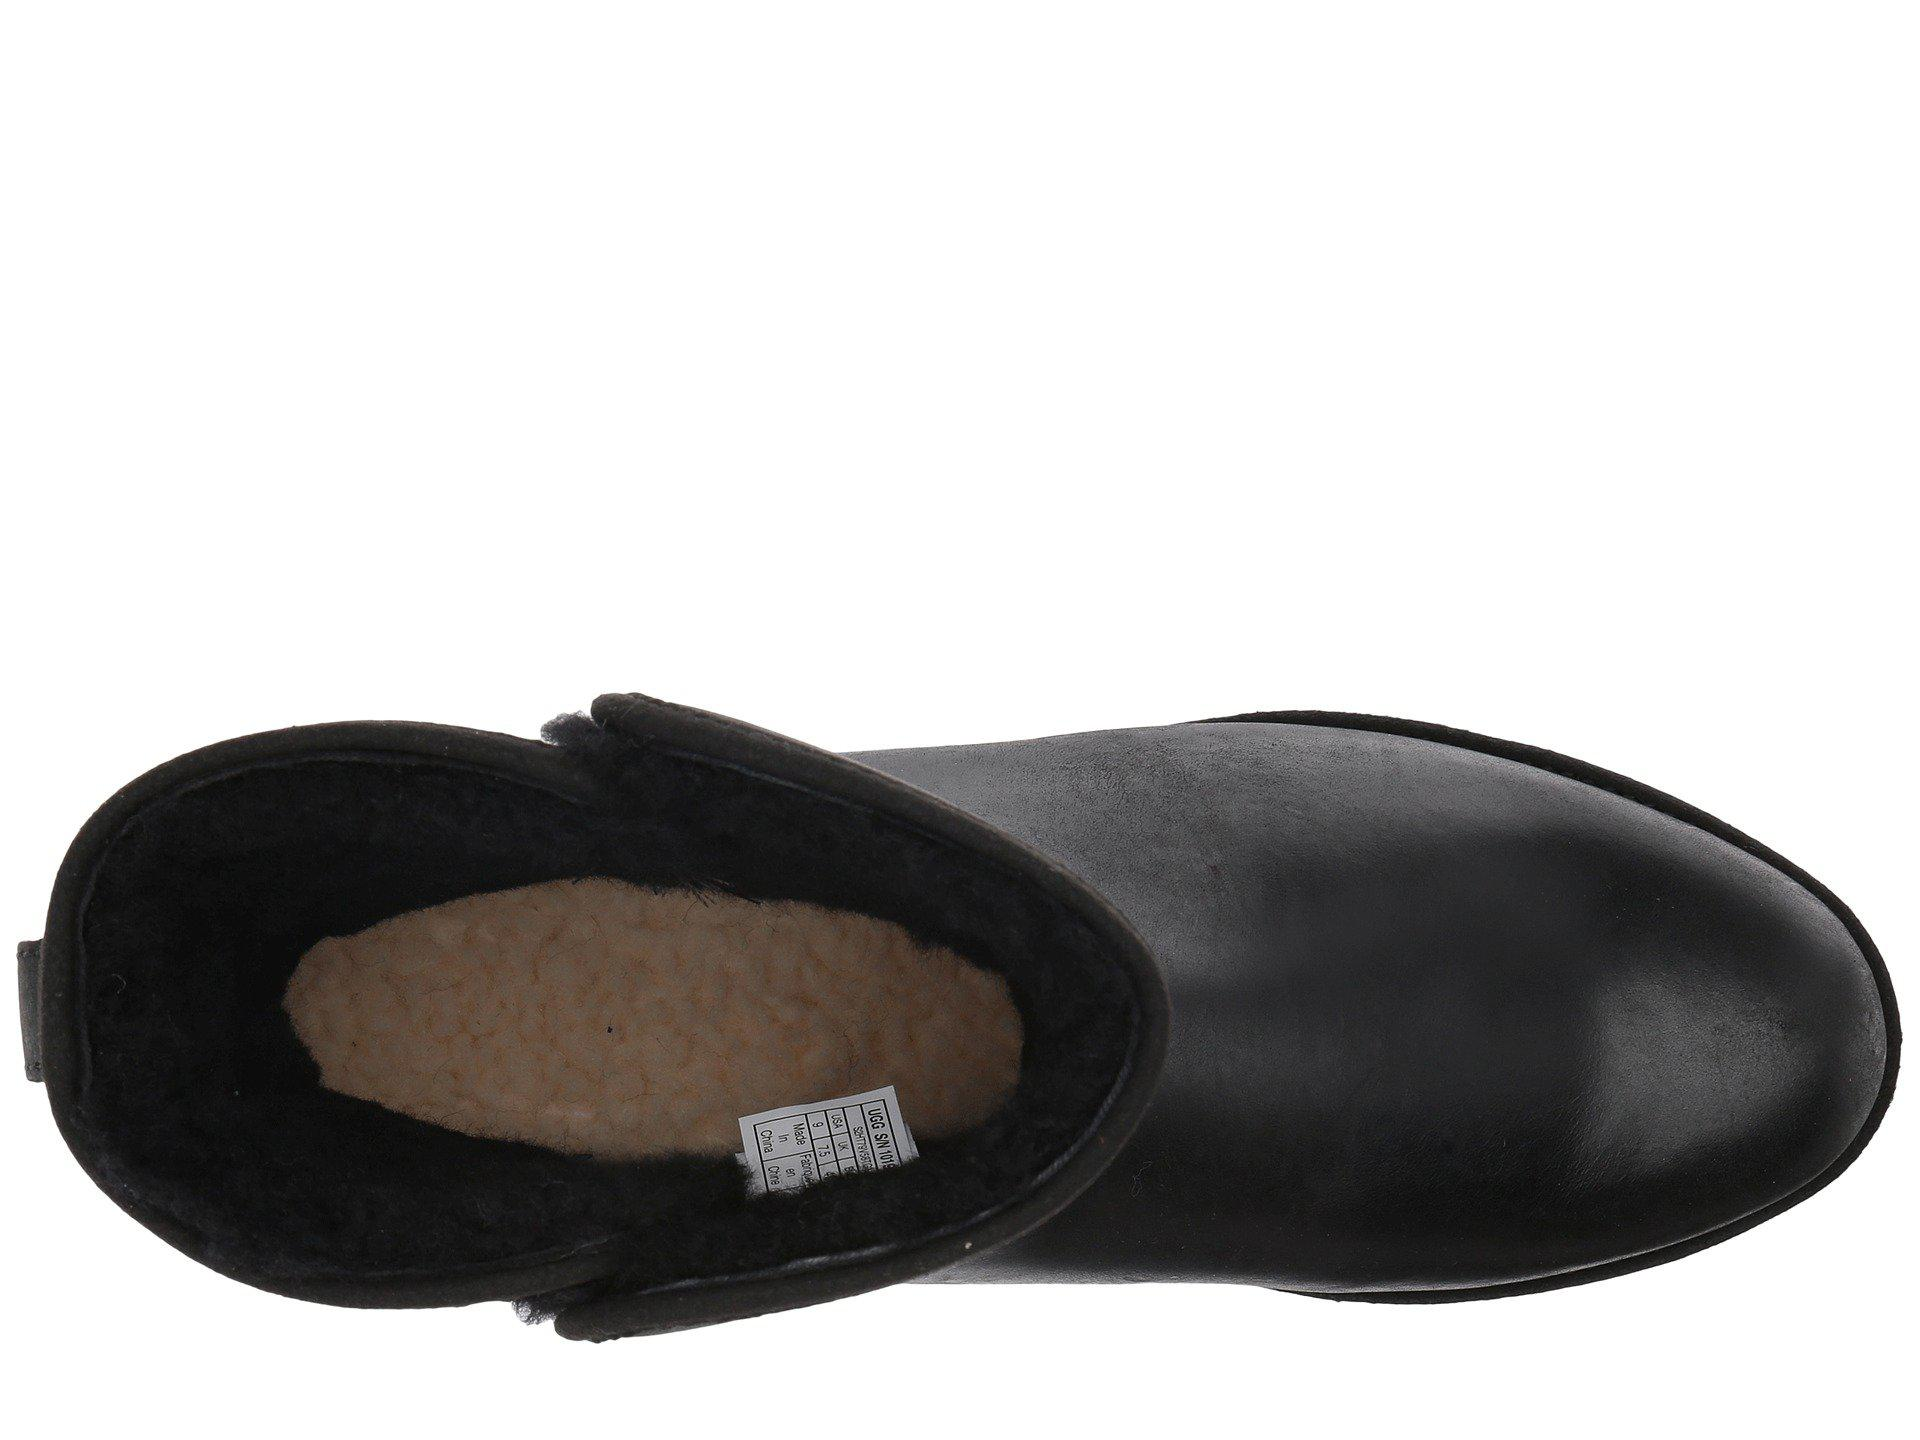 bf7a3e54665 Ugg Black Kristin Leather